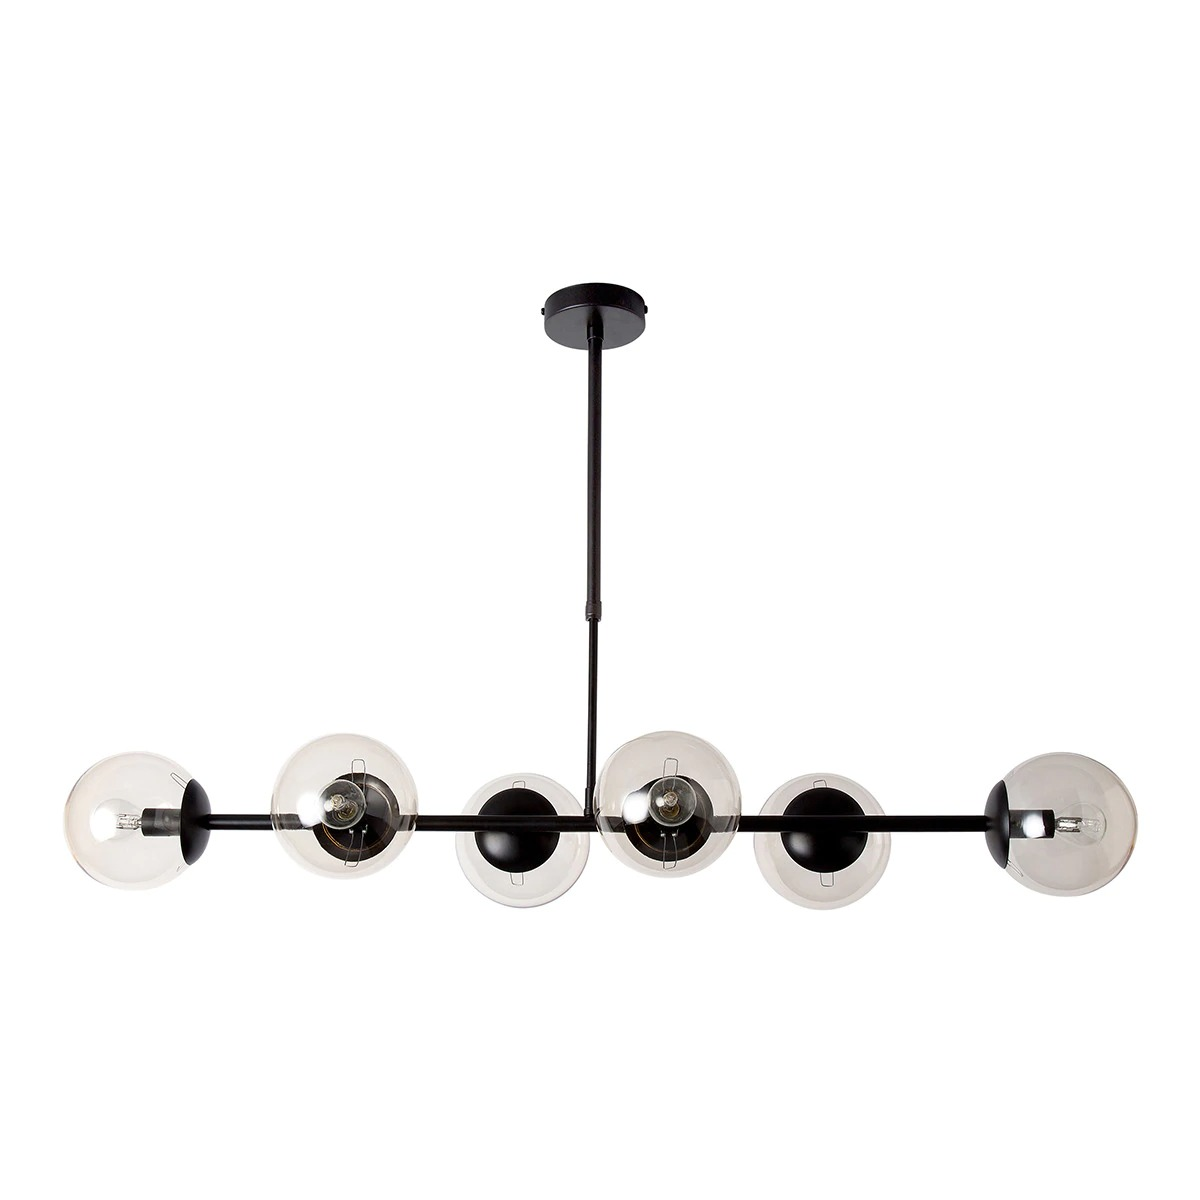 Ofelia Room ceiling lamp - El Corte Inglés